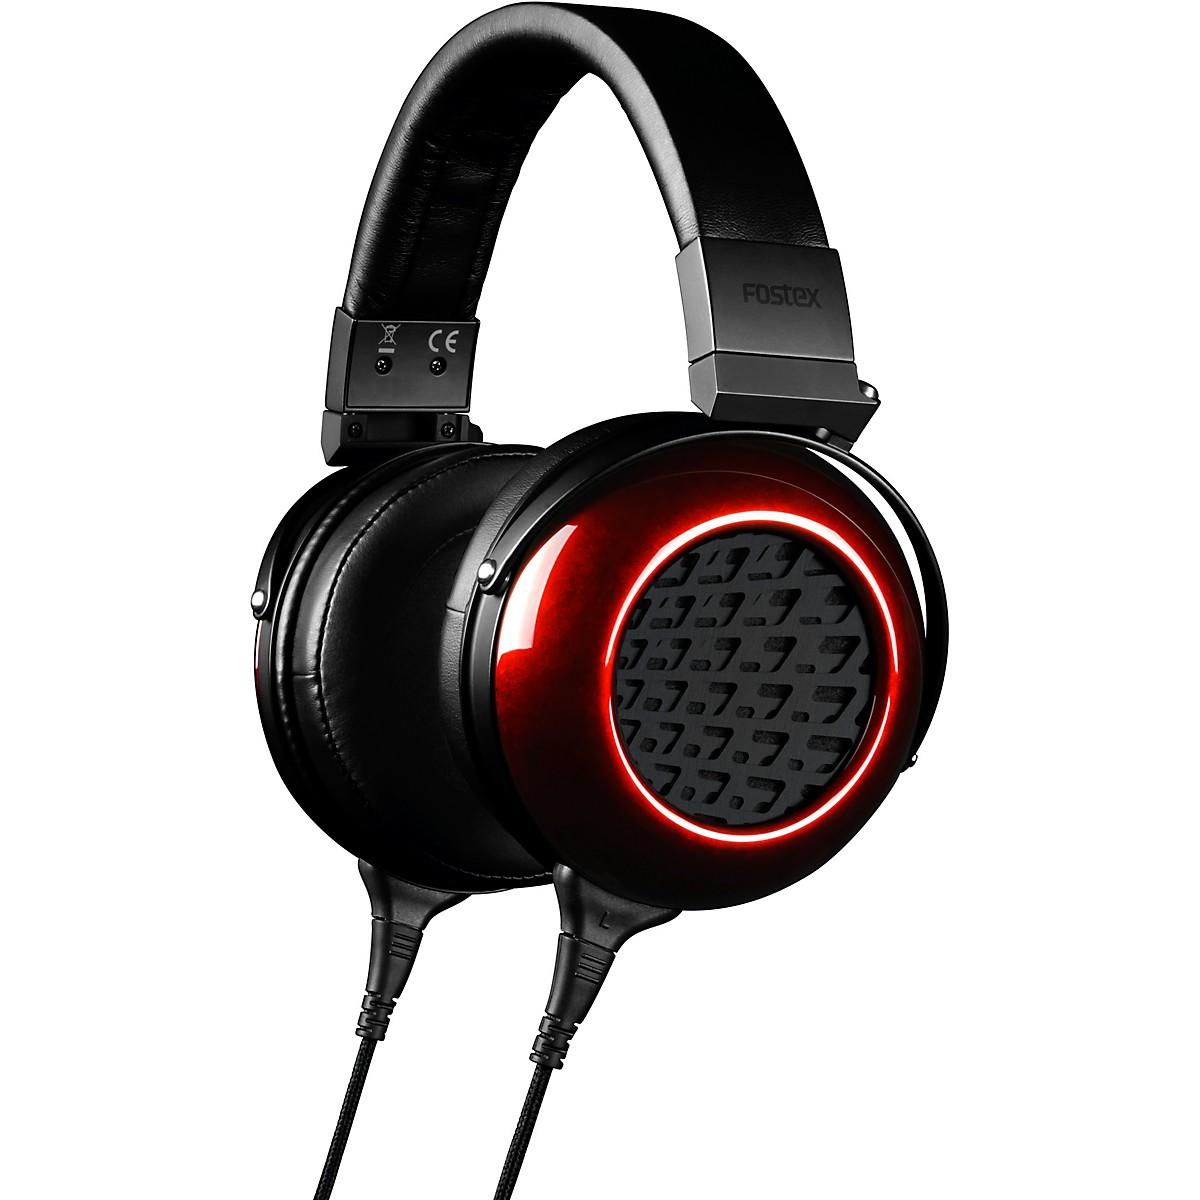 Fostex TH-909 Premium Open-Back Headphones